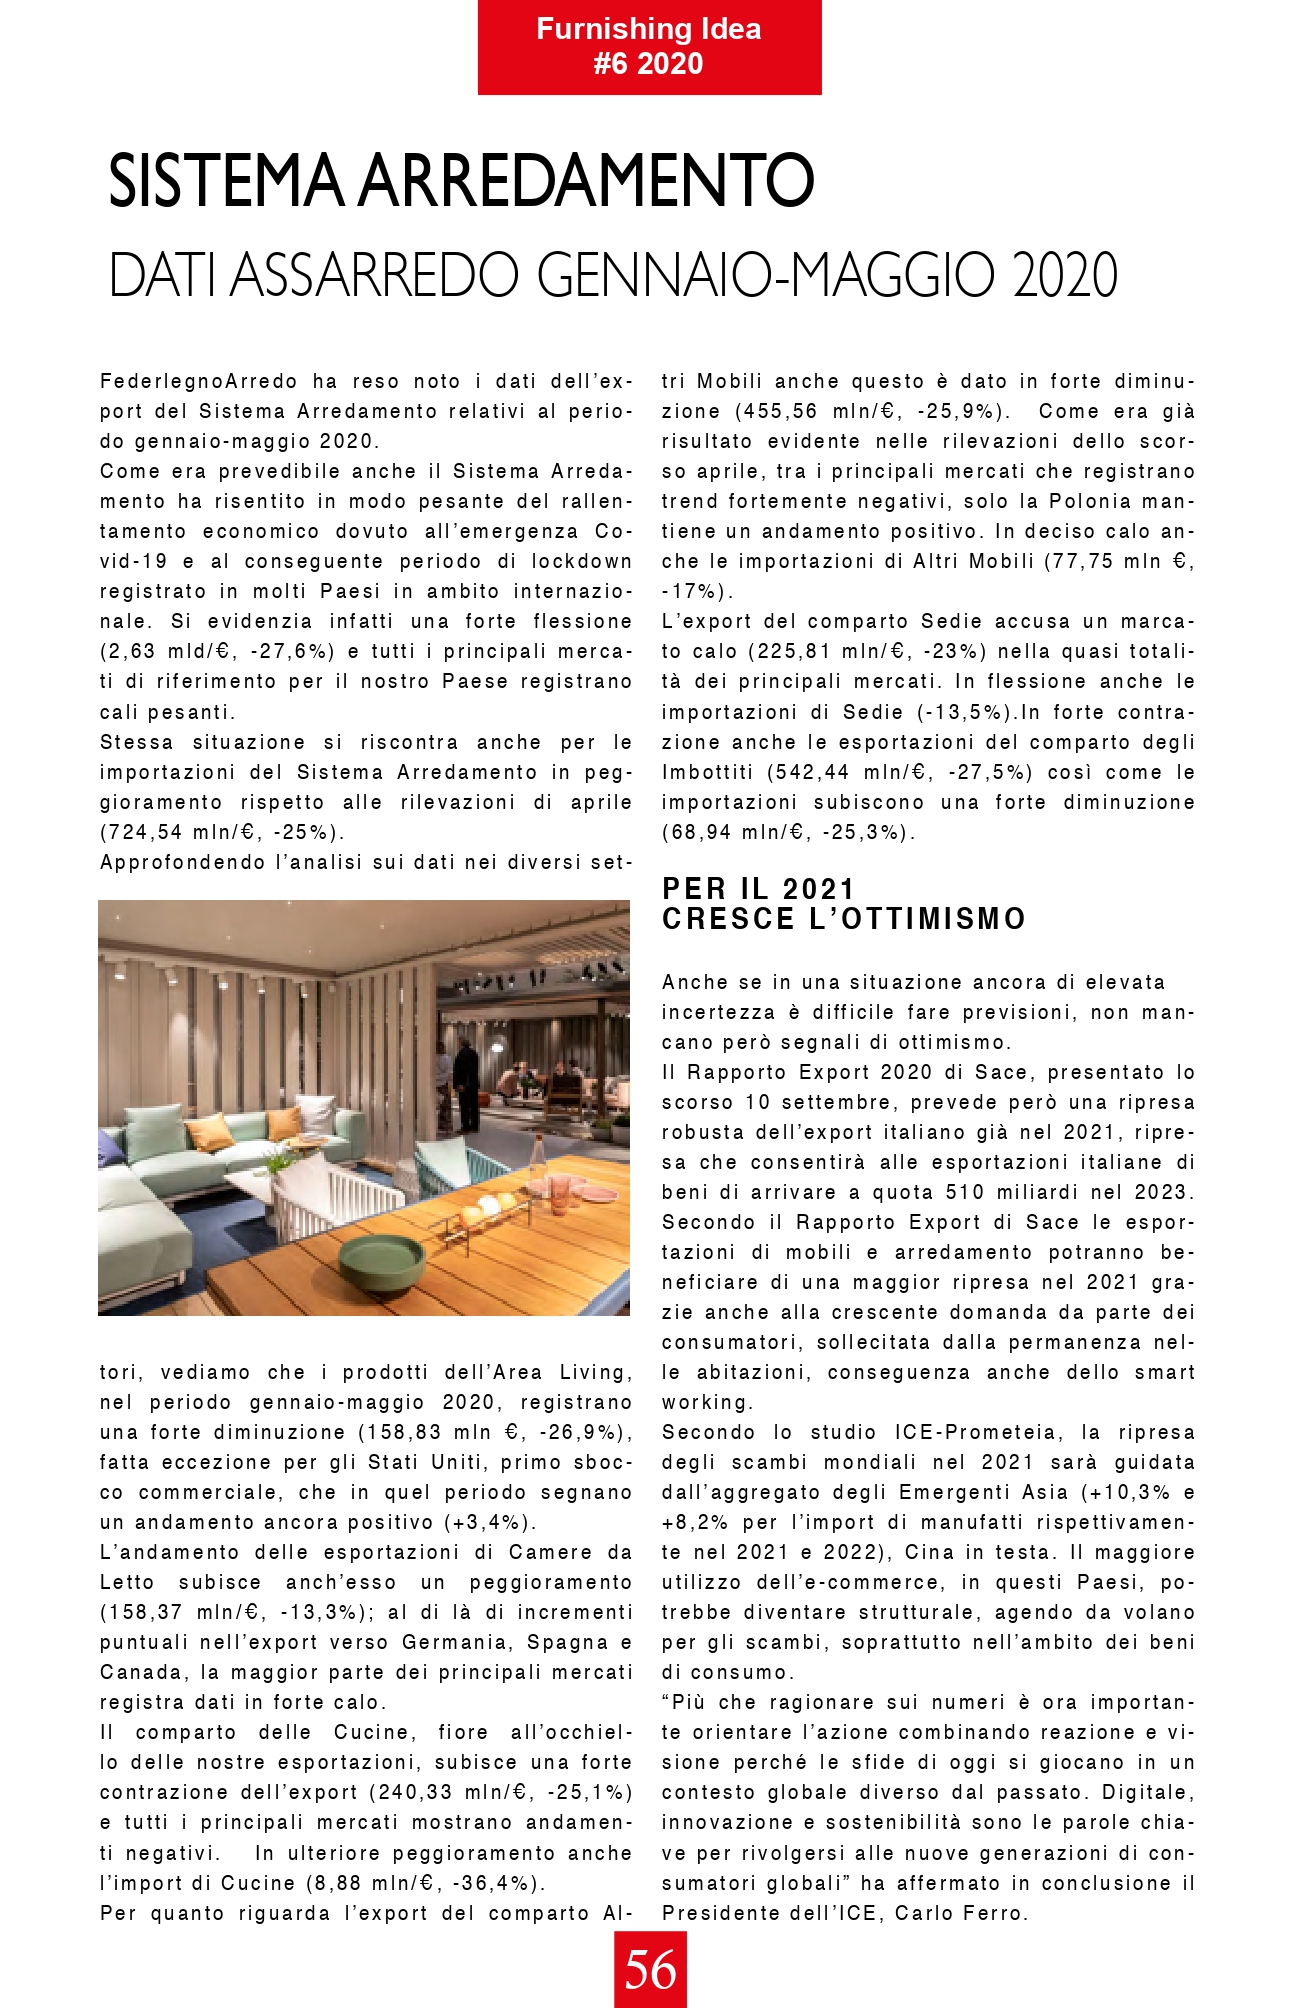 furnishingidea-6-2020_journal_22_055.jpg